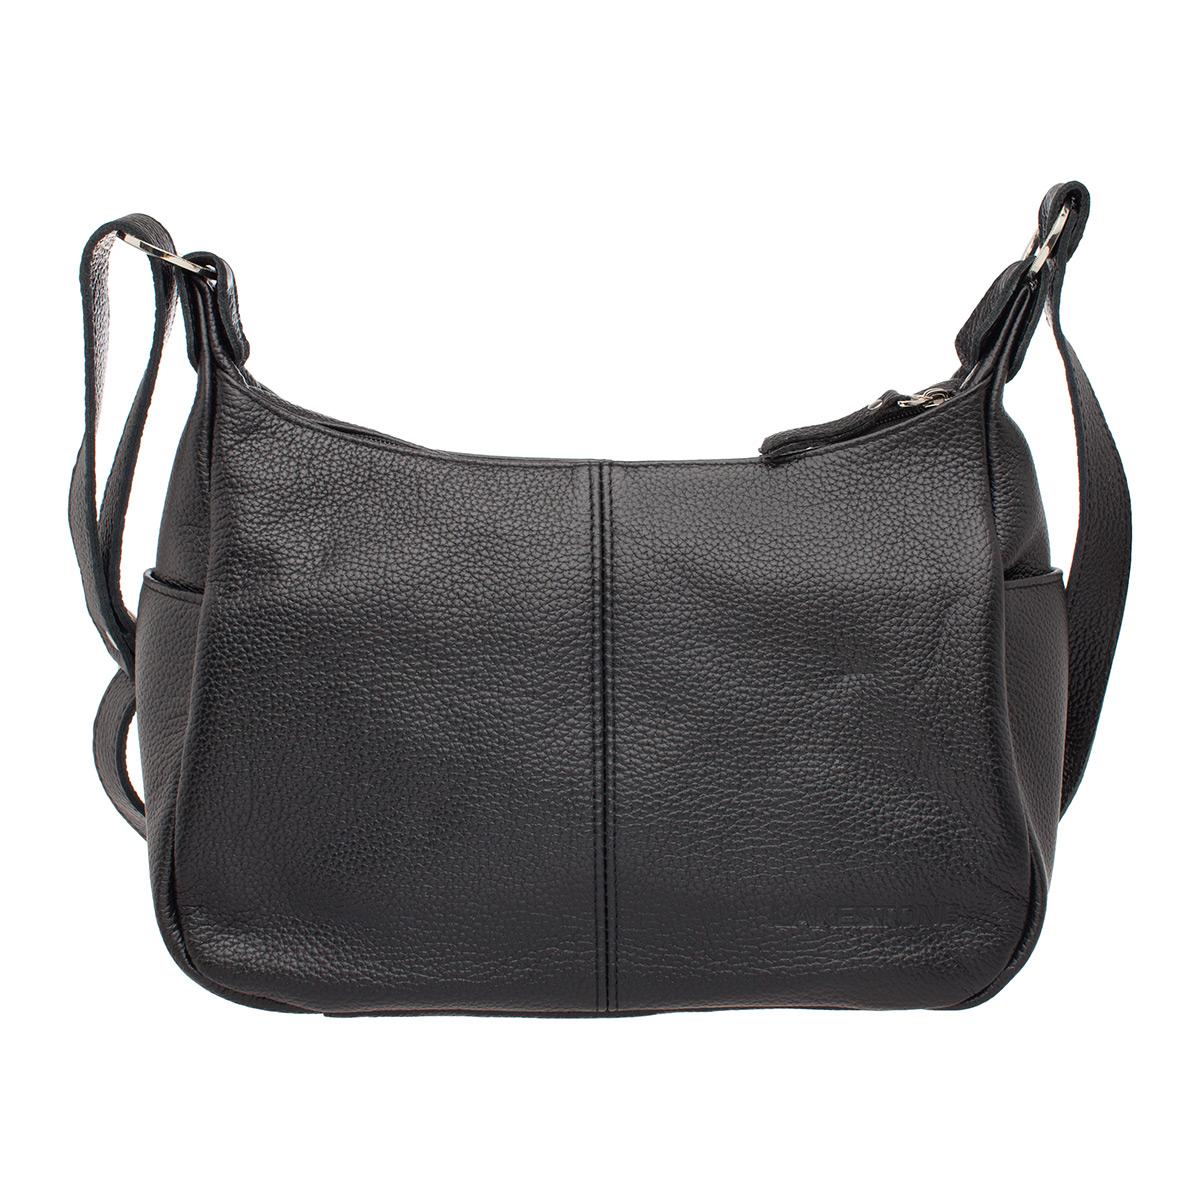 Кожаная сумка через плечо Tracey Black